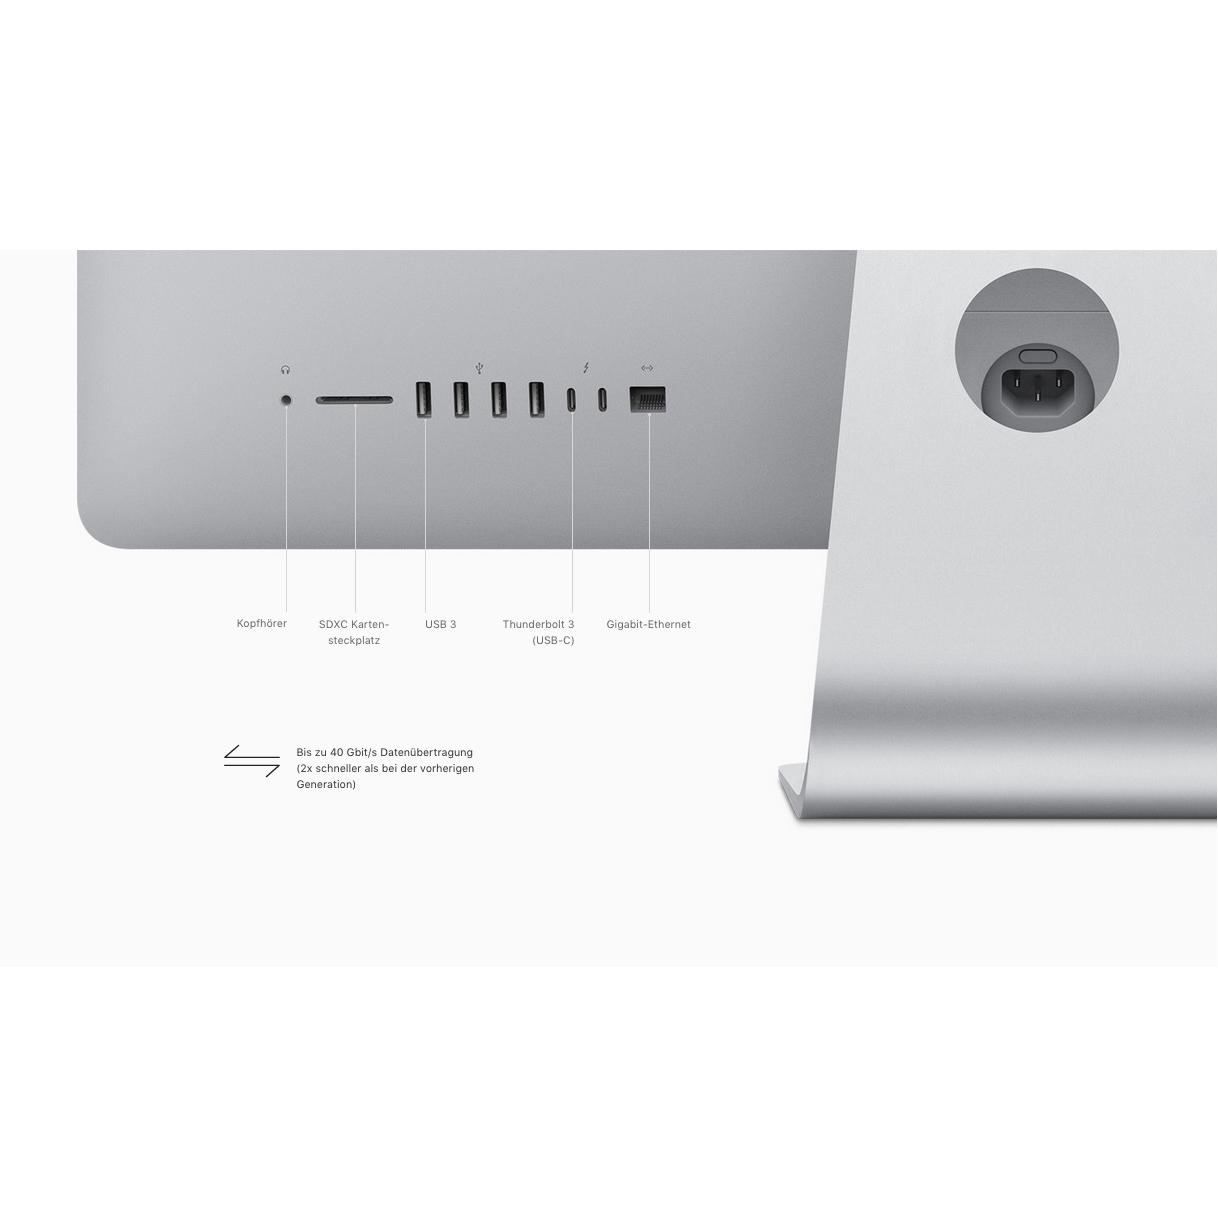 apple imac 27 retina 5k 3 4ghz i5 8gb 1tb fusion. Black Bedroom Furniture Sets. Home Design Ideas